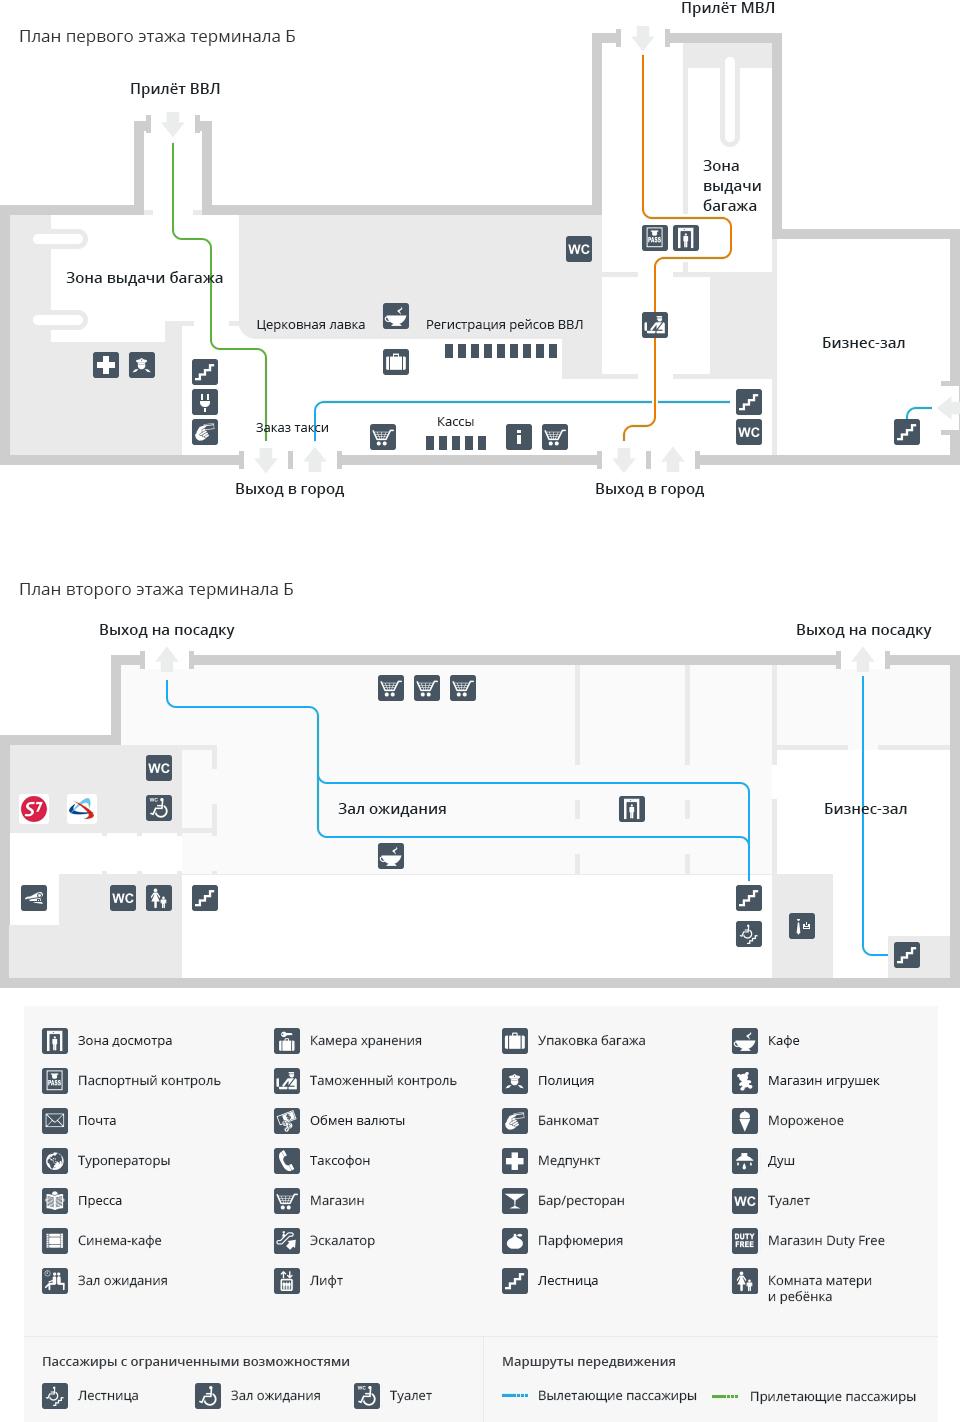 Аэропорт Чита: схема терминала Б